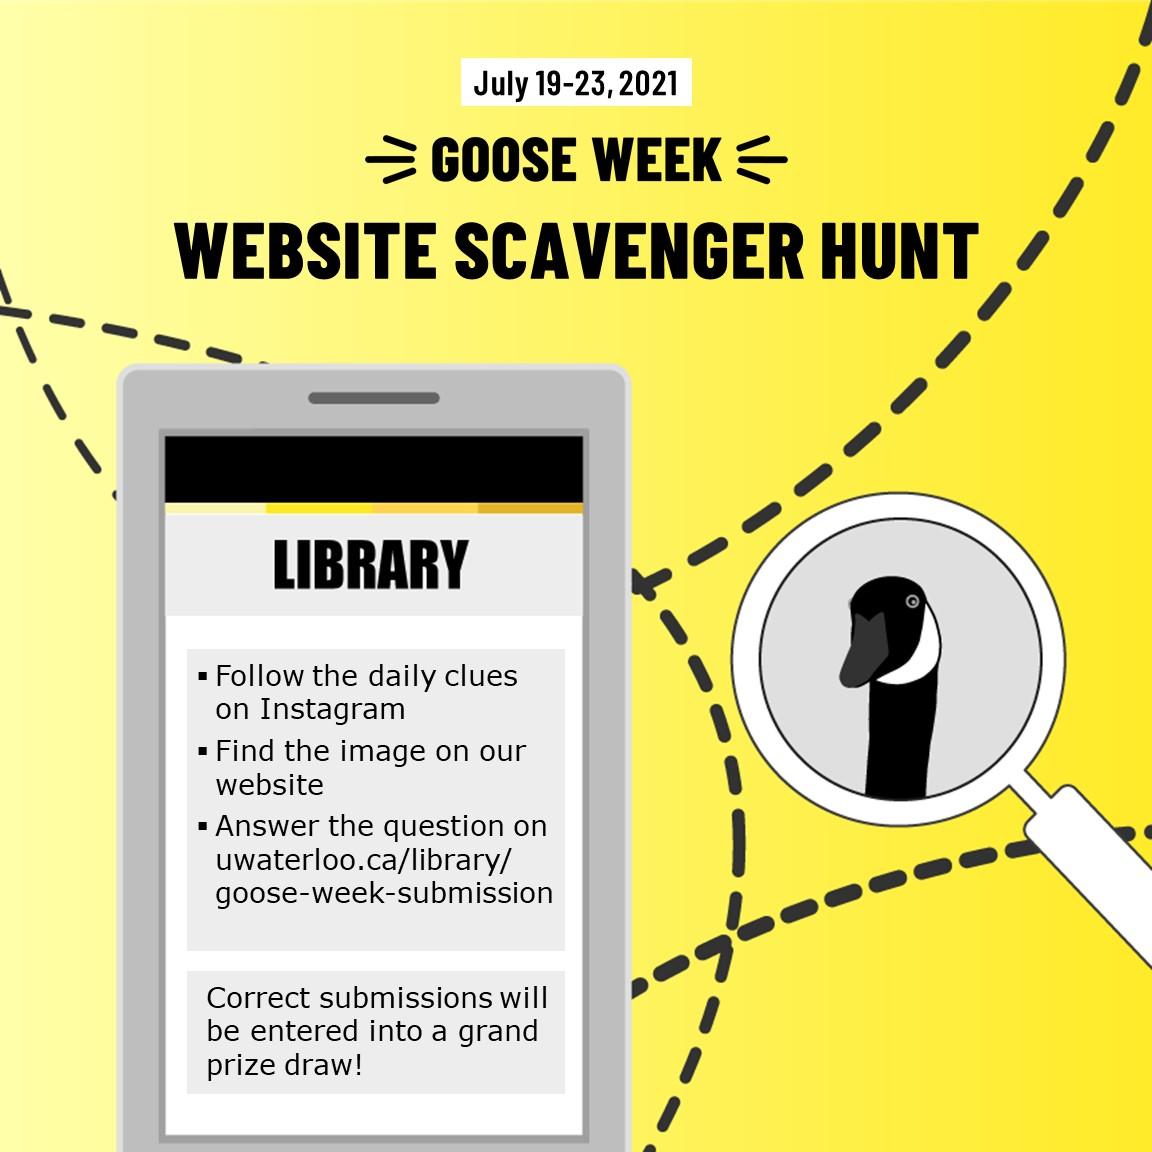 Goose Week 2021 Website Scavenger Hunt